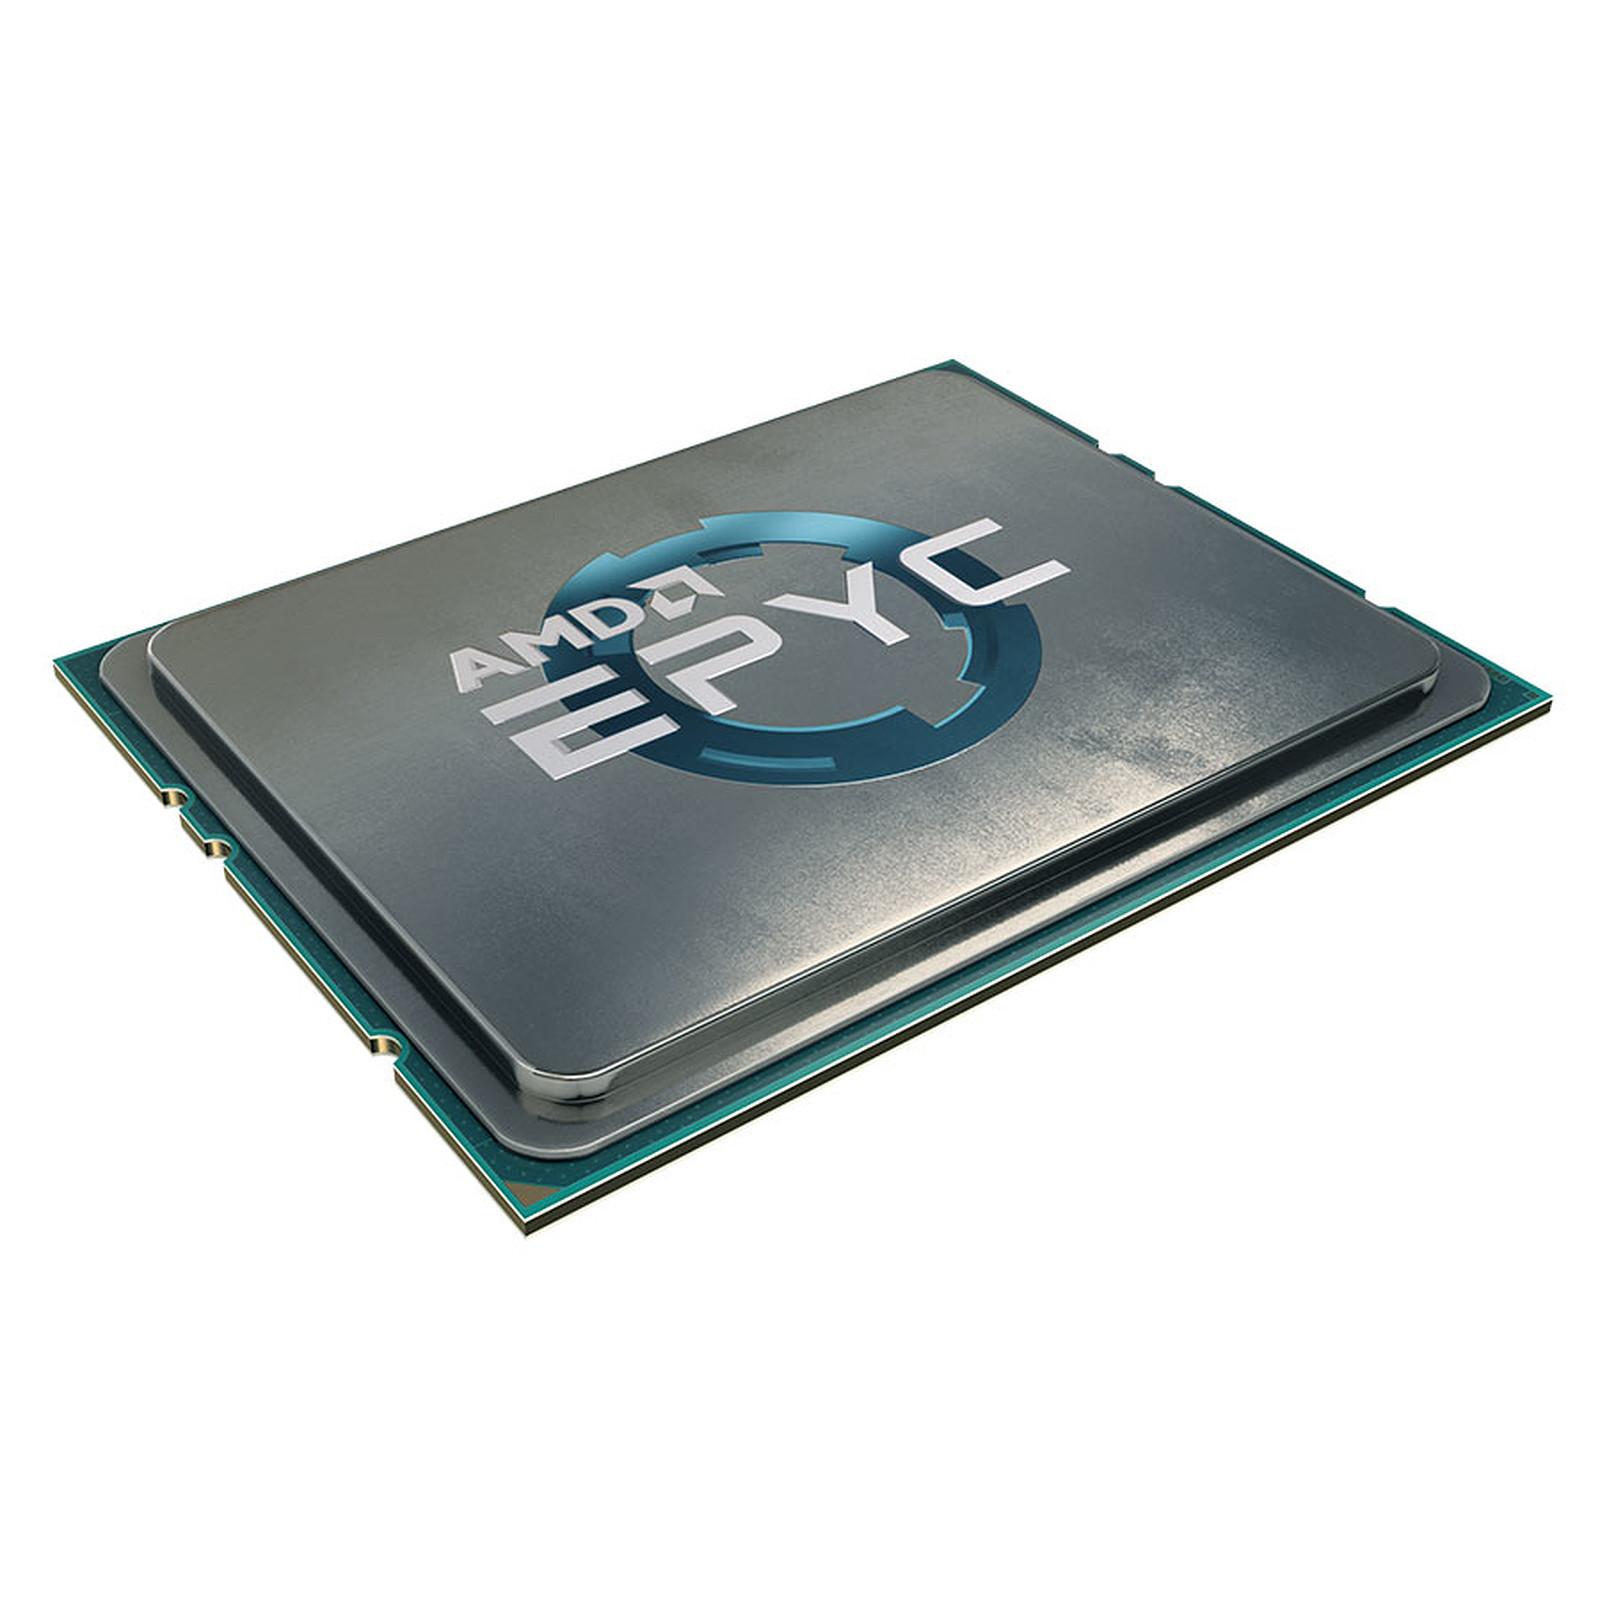 AMD EPYC 7702 (2.0 GHz)